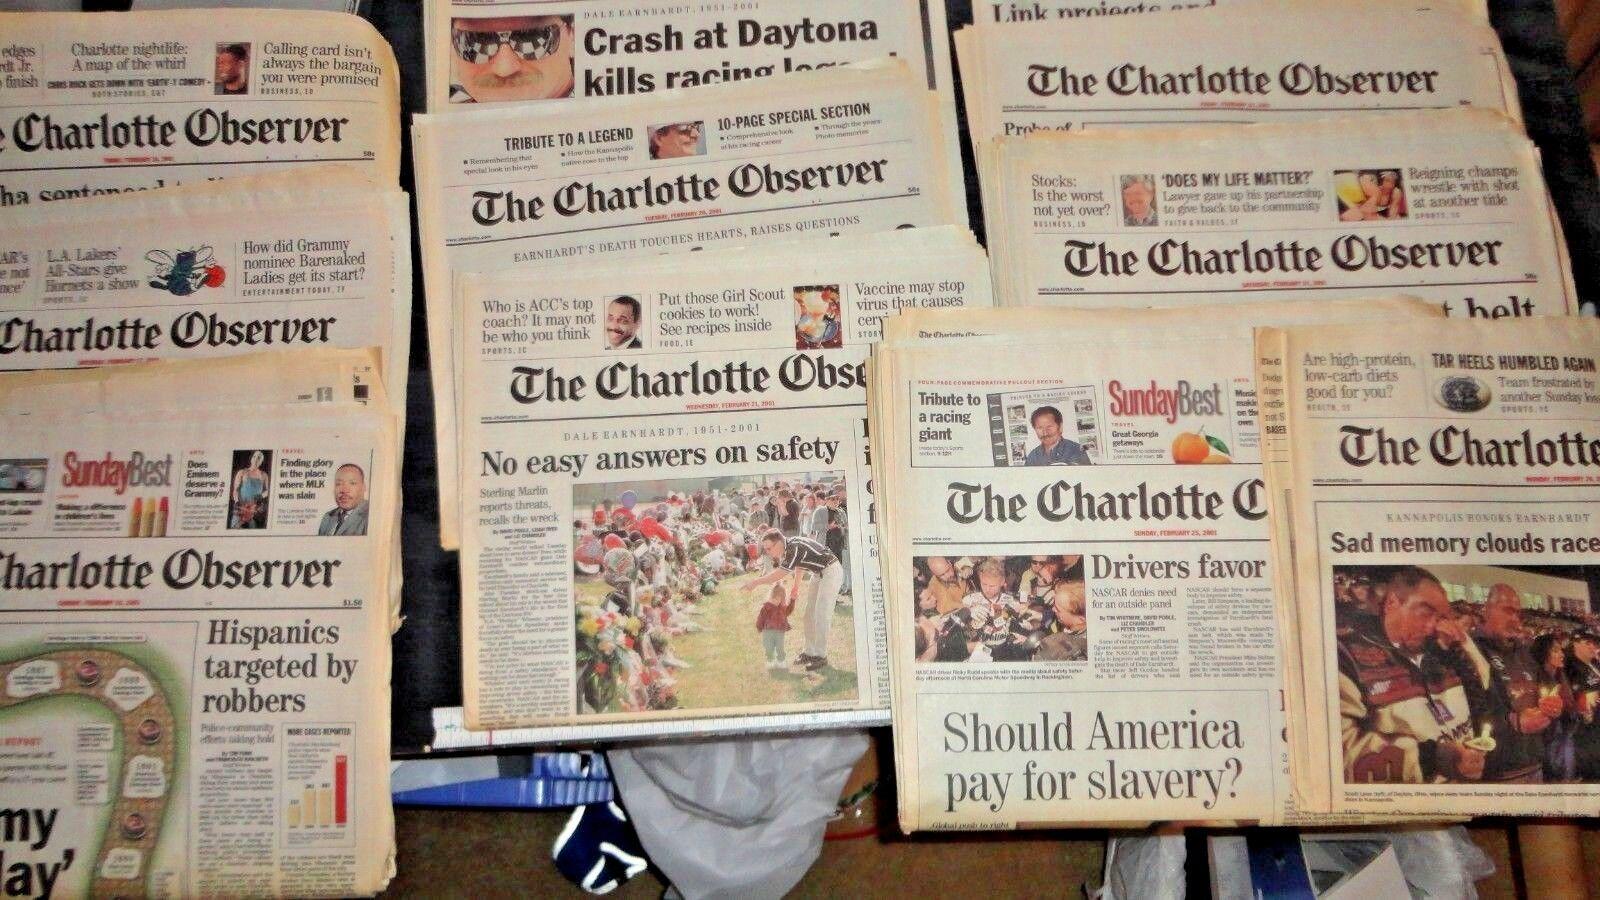 Lote de periódico Observador Charlotte la muerte de Dale Earnhardt toda la semana + Lote de 11